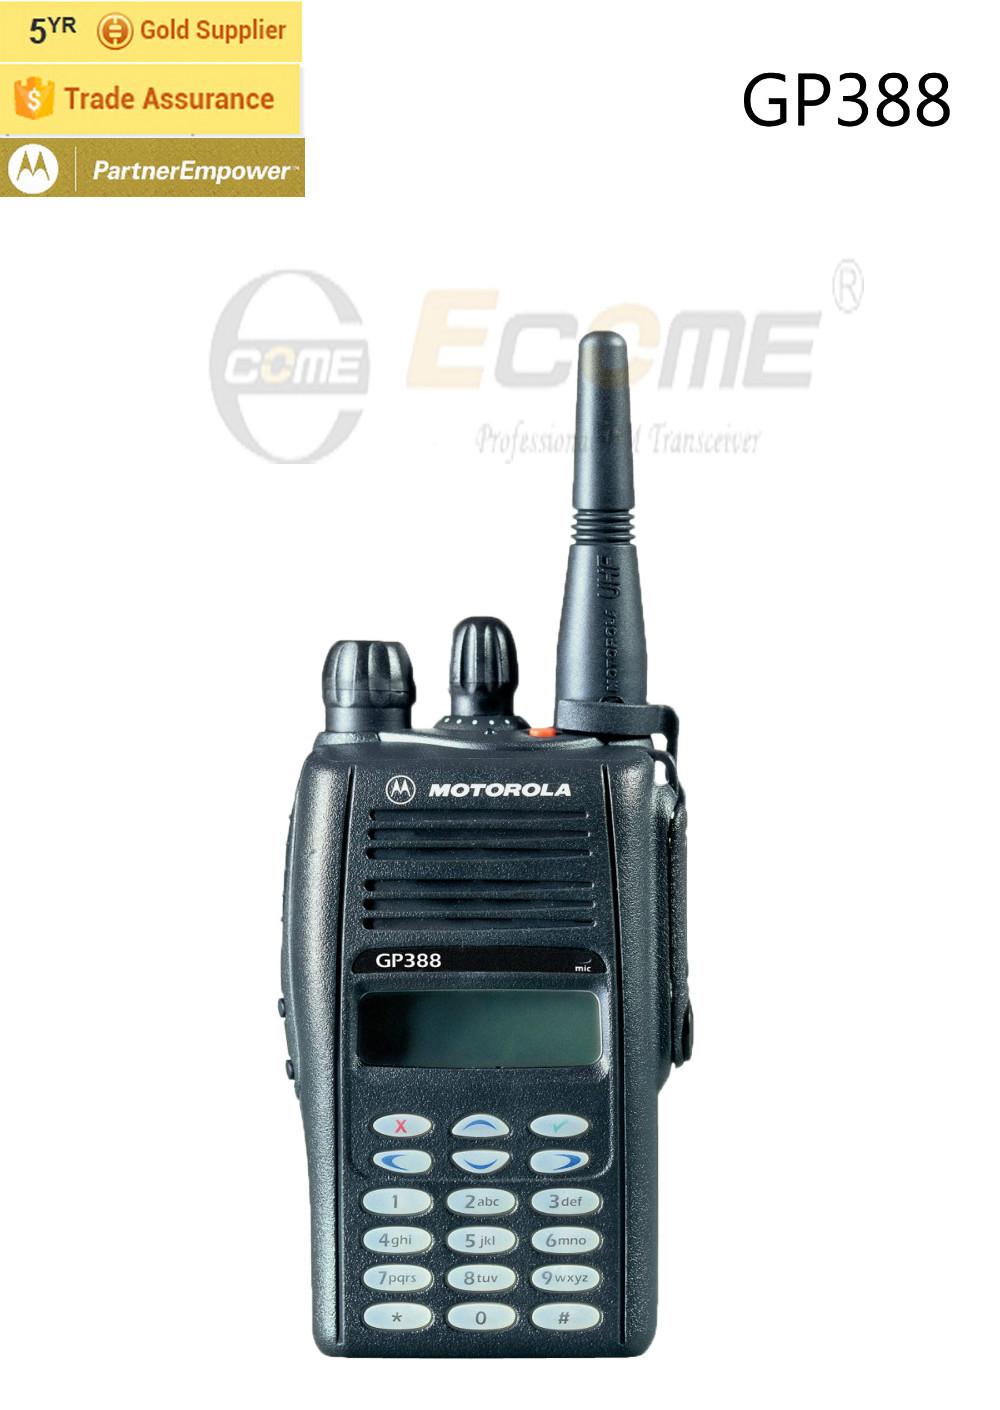 Motorola Two Way Intercom GP388 Walkie Talkie for Group Talking(China (Mainland))